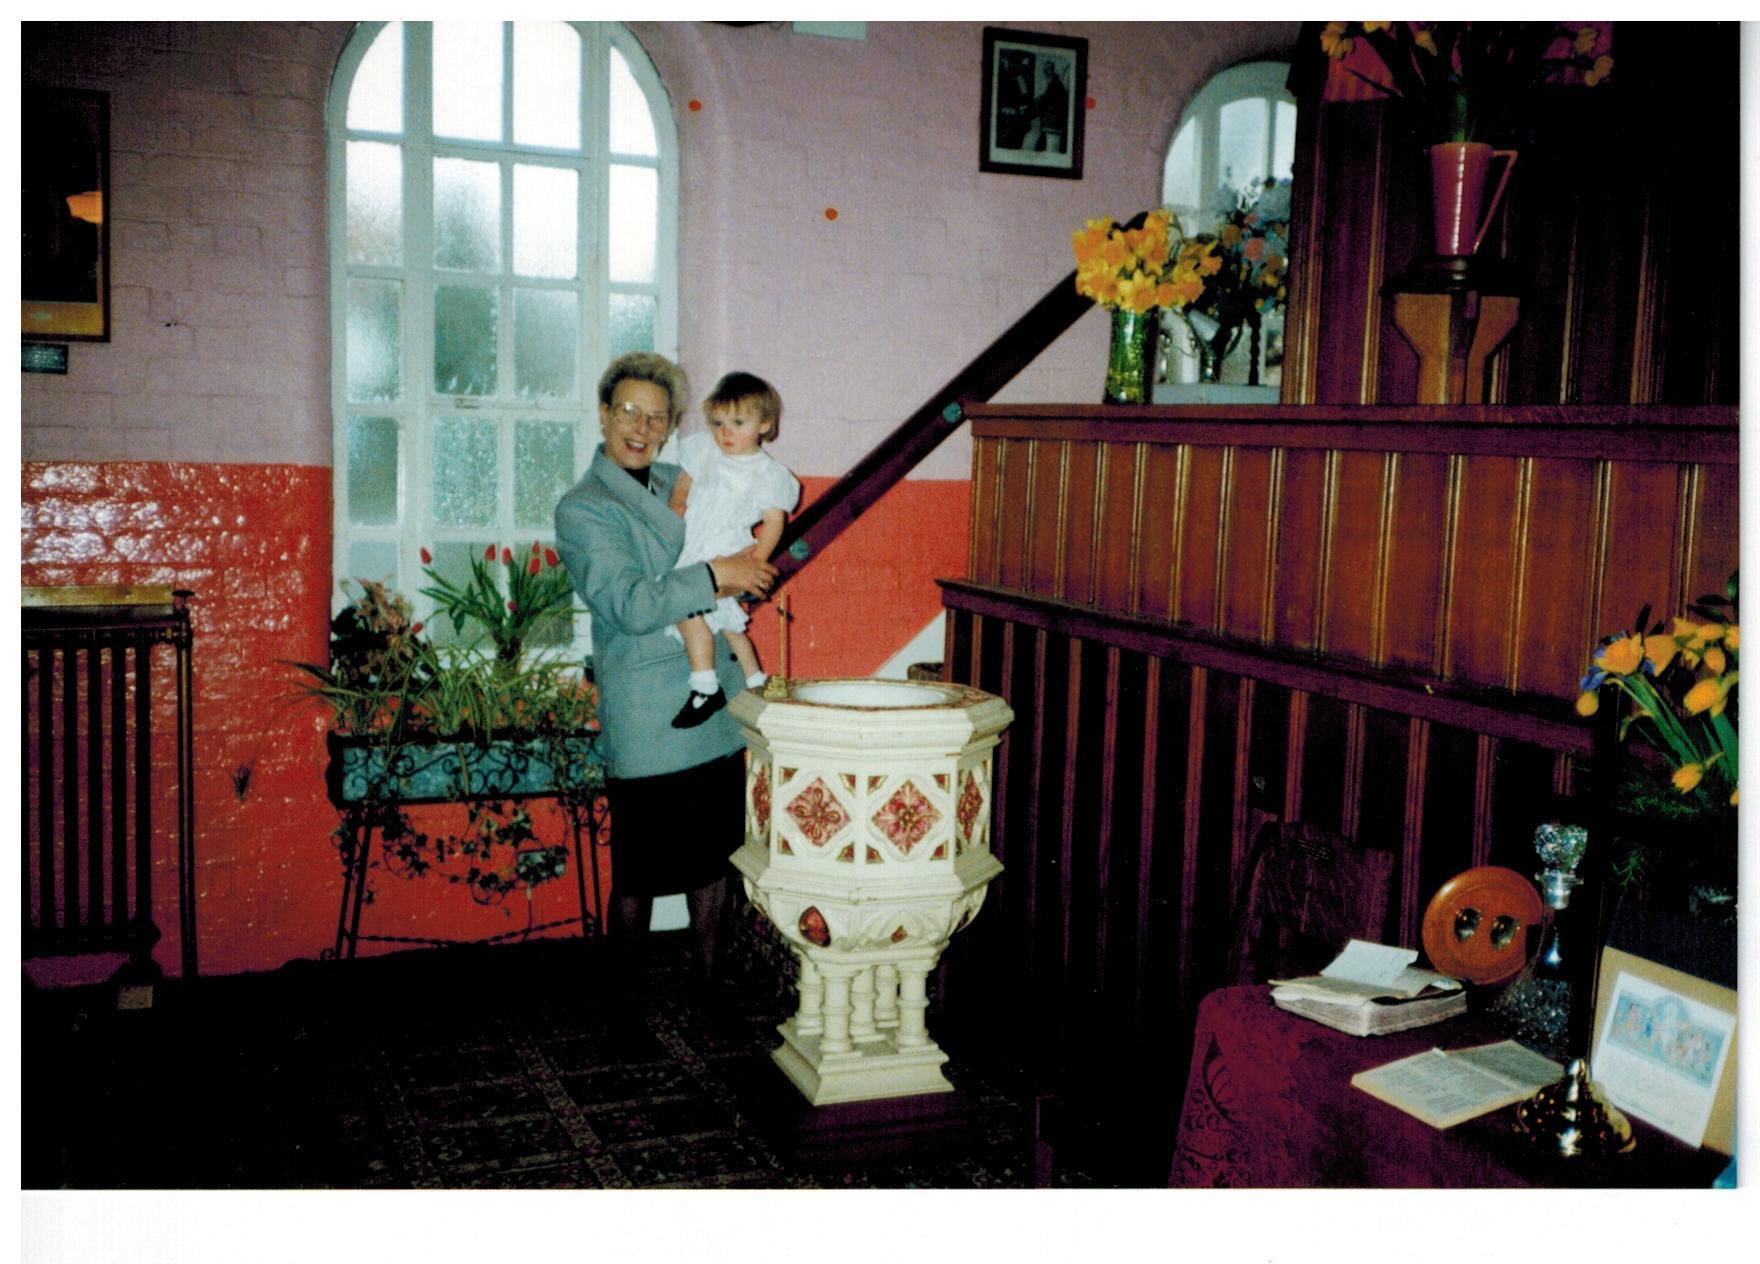 C006 Hazel_with_Zoe_Jane-EVETTS[baptism28-03-93]